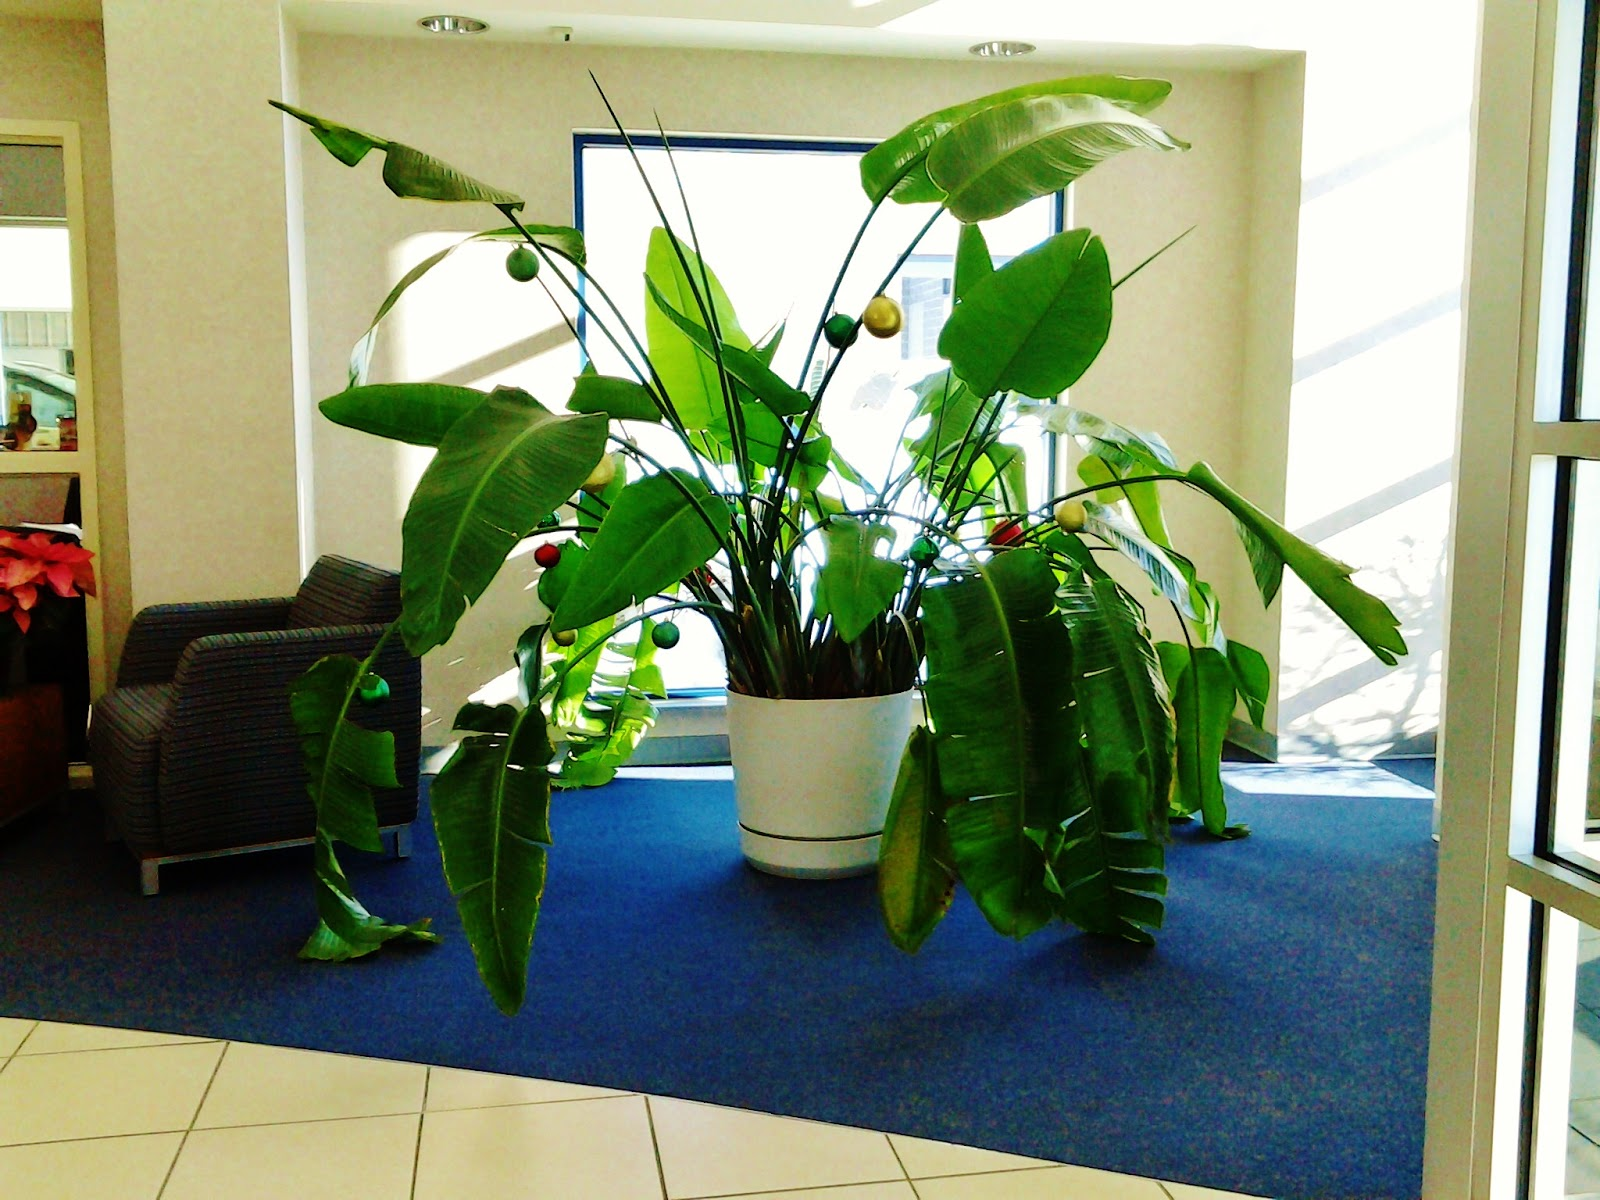 Boyett bandwagon the great grandma of indoor potted plants - Great indoor houseplants ...